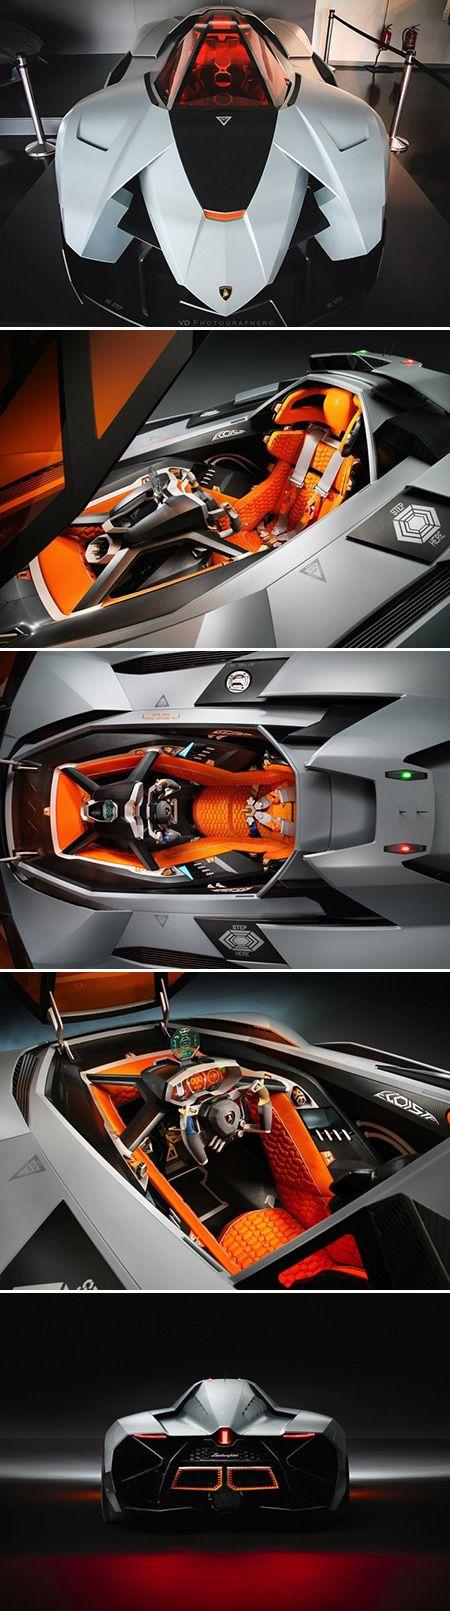 best 25 lamborghini cars ideas on pinterest lamborghini lamborghini huracan and dream cars. Black Bedroom Furniture Sets. Home Design Ideas